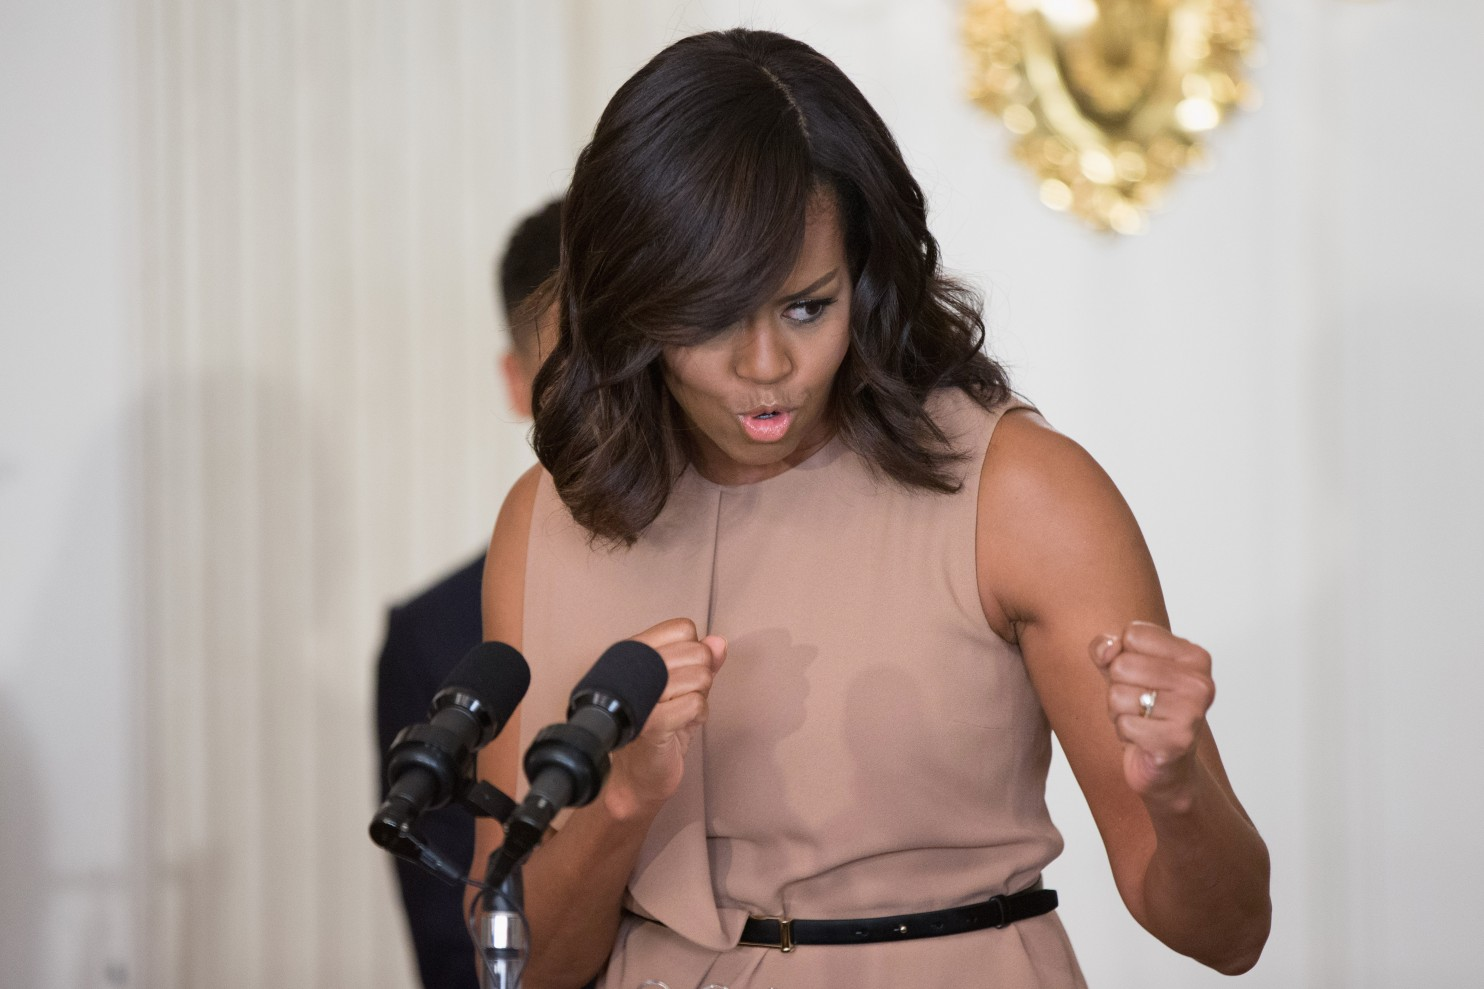 APTOPIX_Michelle_Obama-0e336